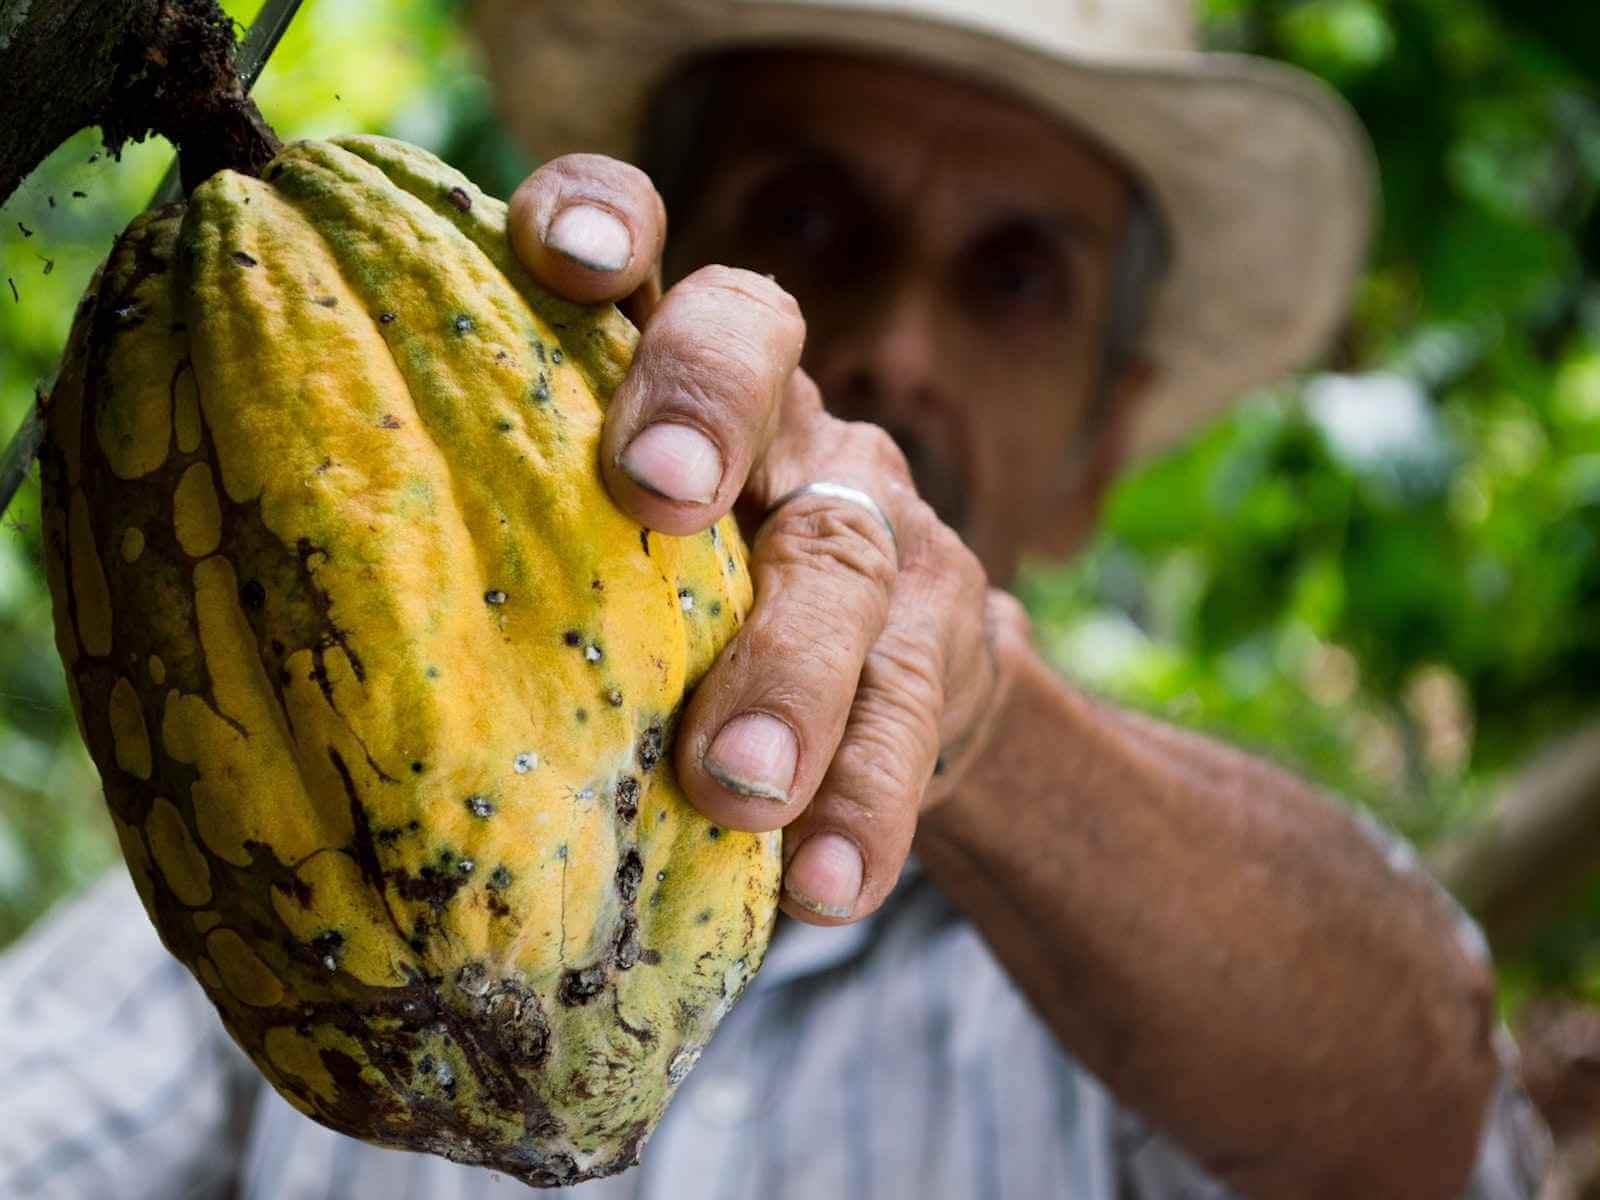 Puerto Viejo bezienswaardigheden & activiteiten: chocolade tour